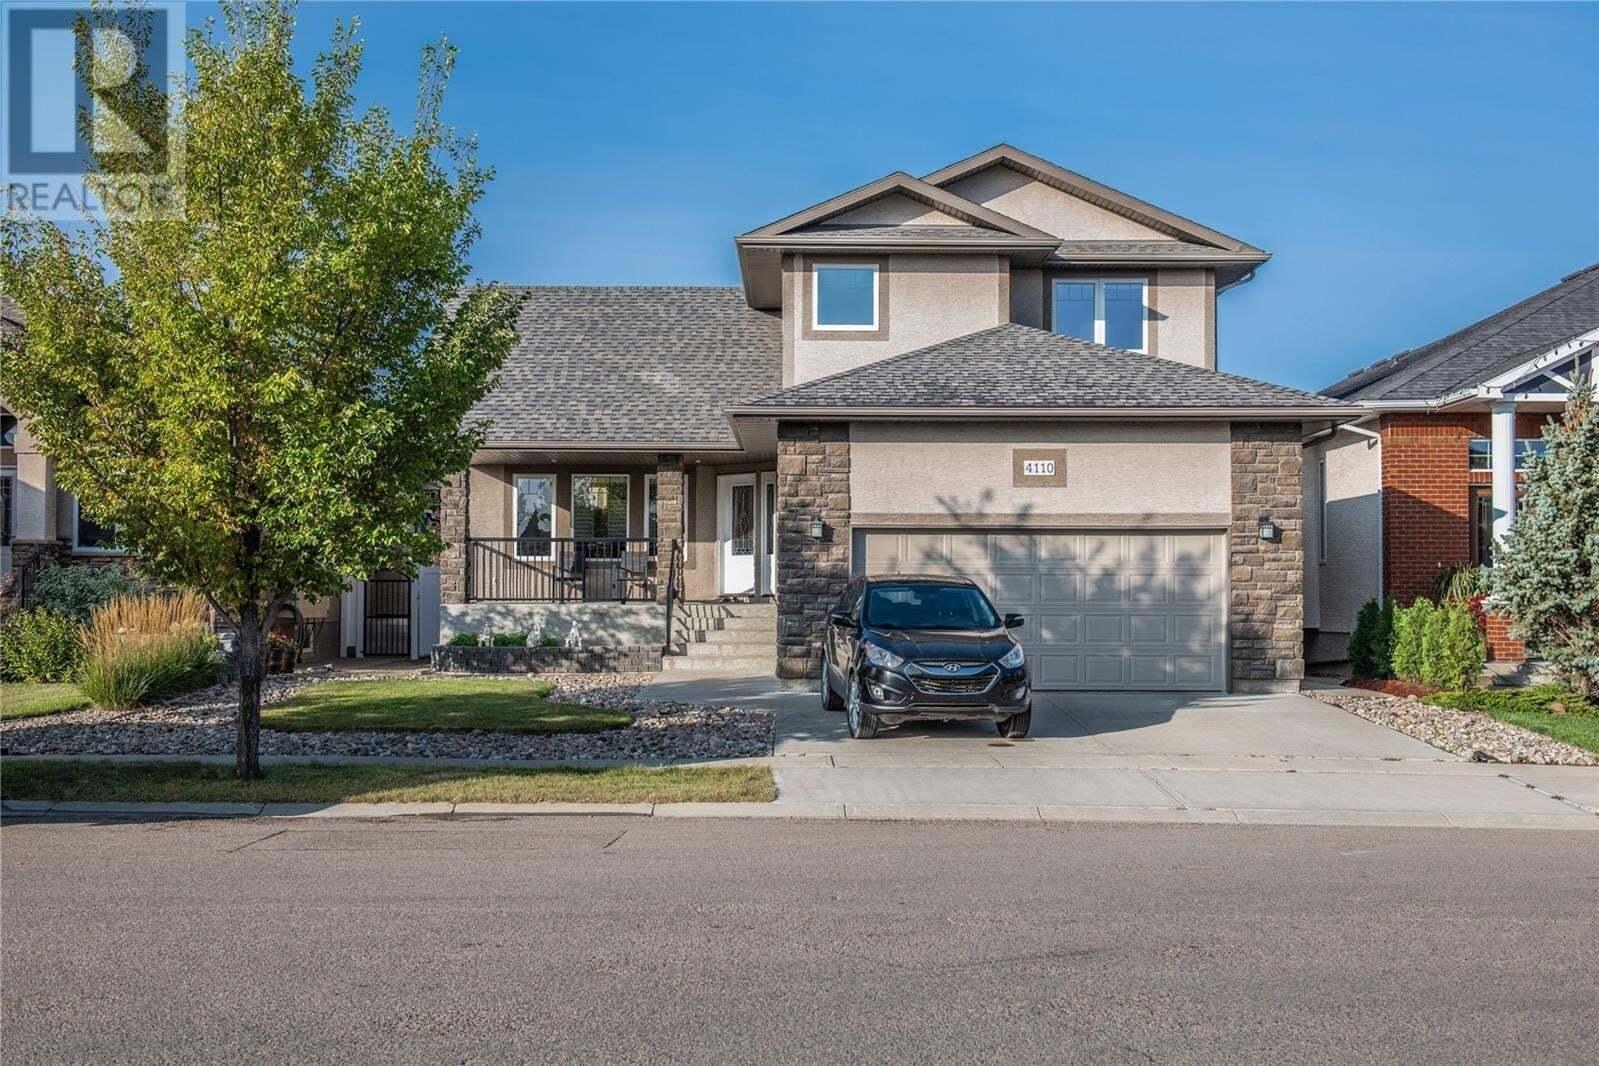 House for sale at 4110 Goldfinch Wy Regina Saskatchewan - MLS: SK826750